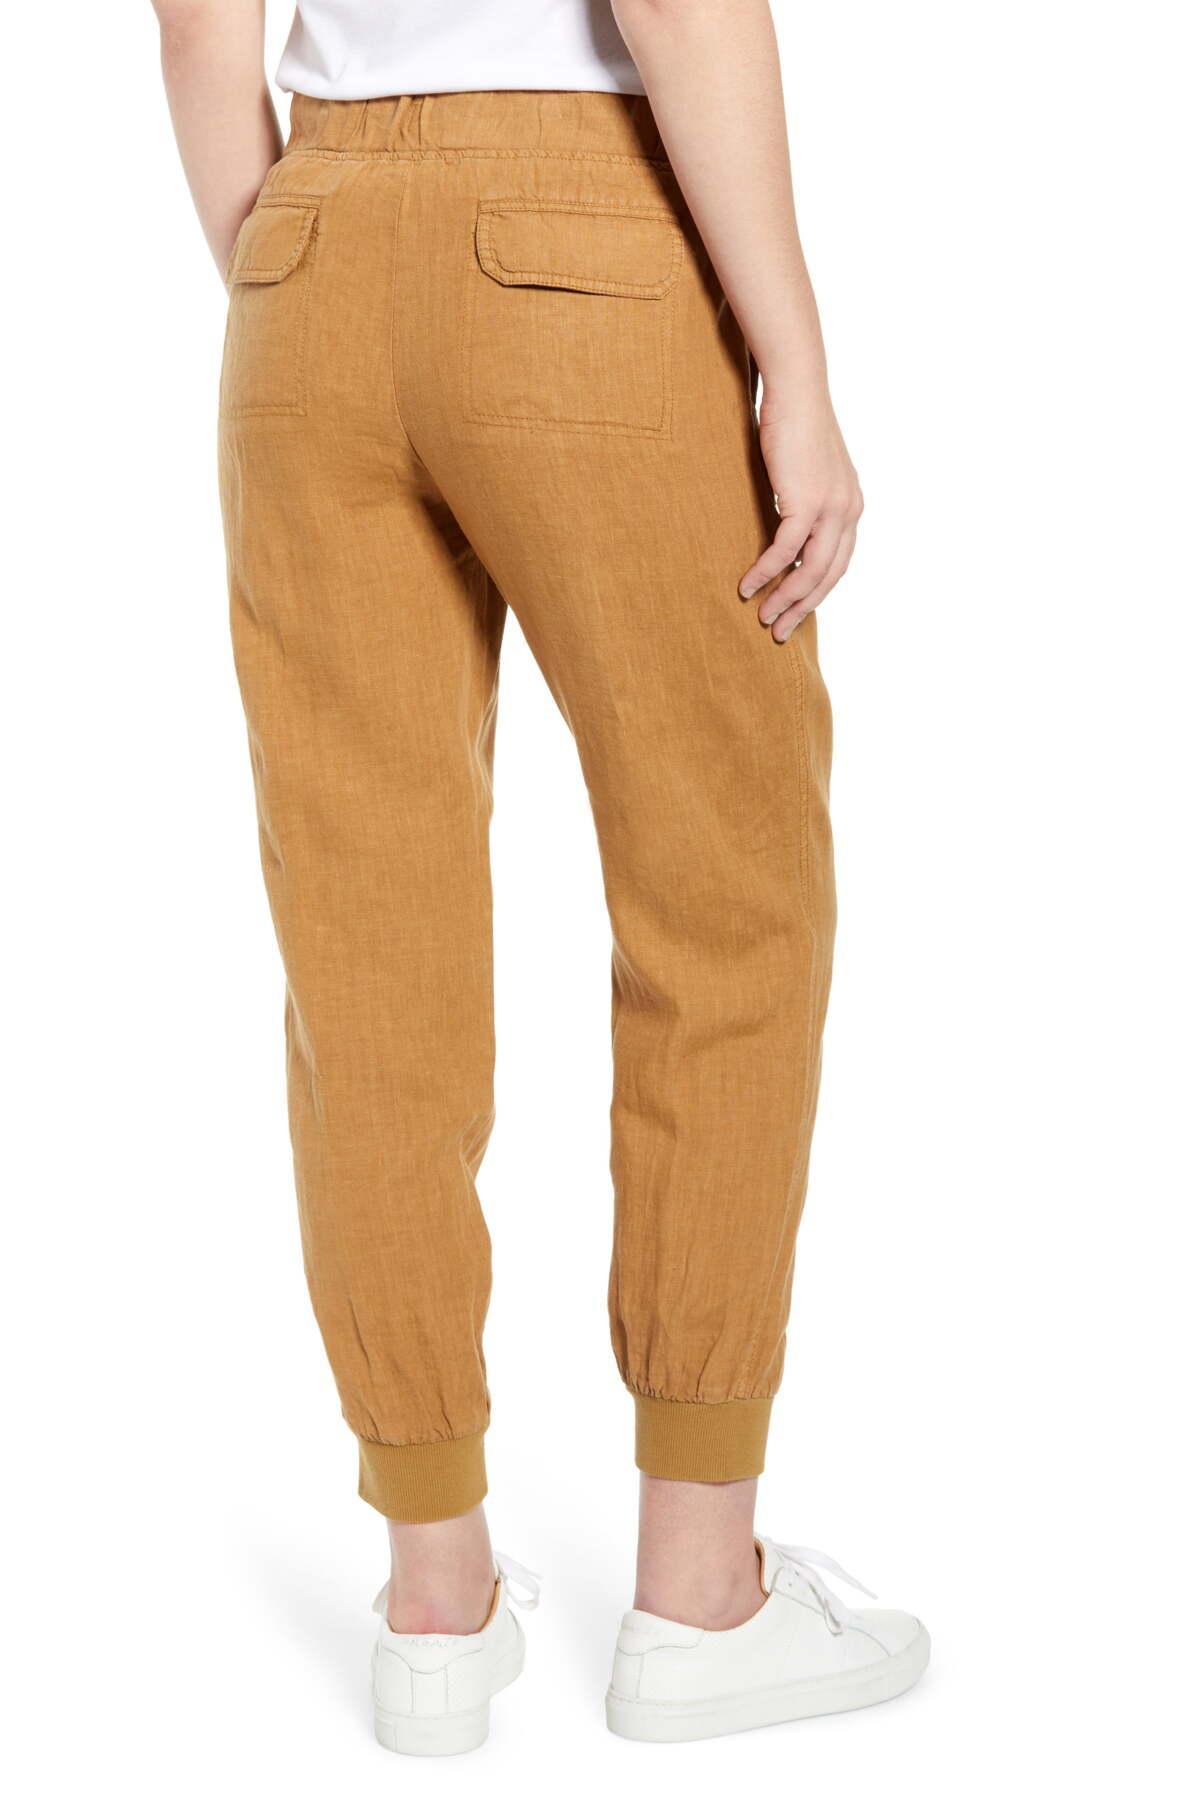 Caslon Linen Jogger Pants Black NWT $59